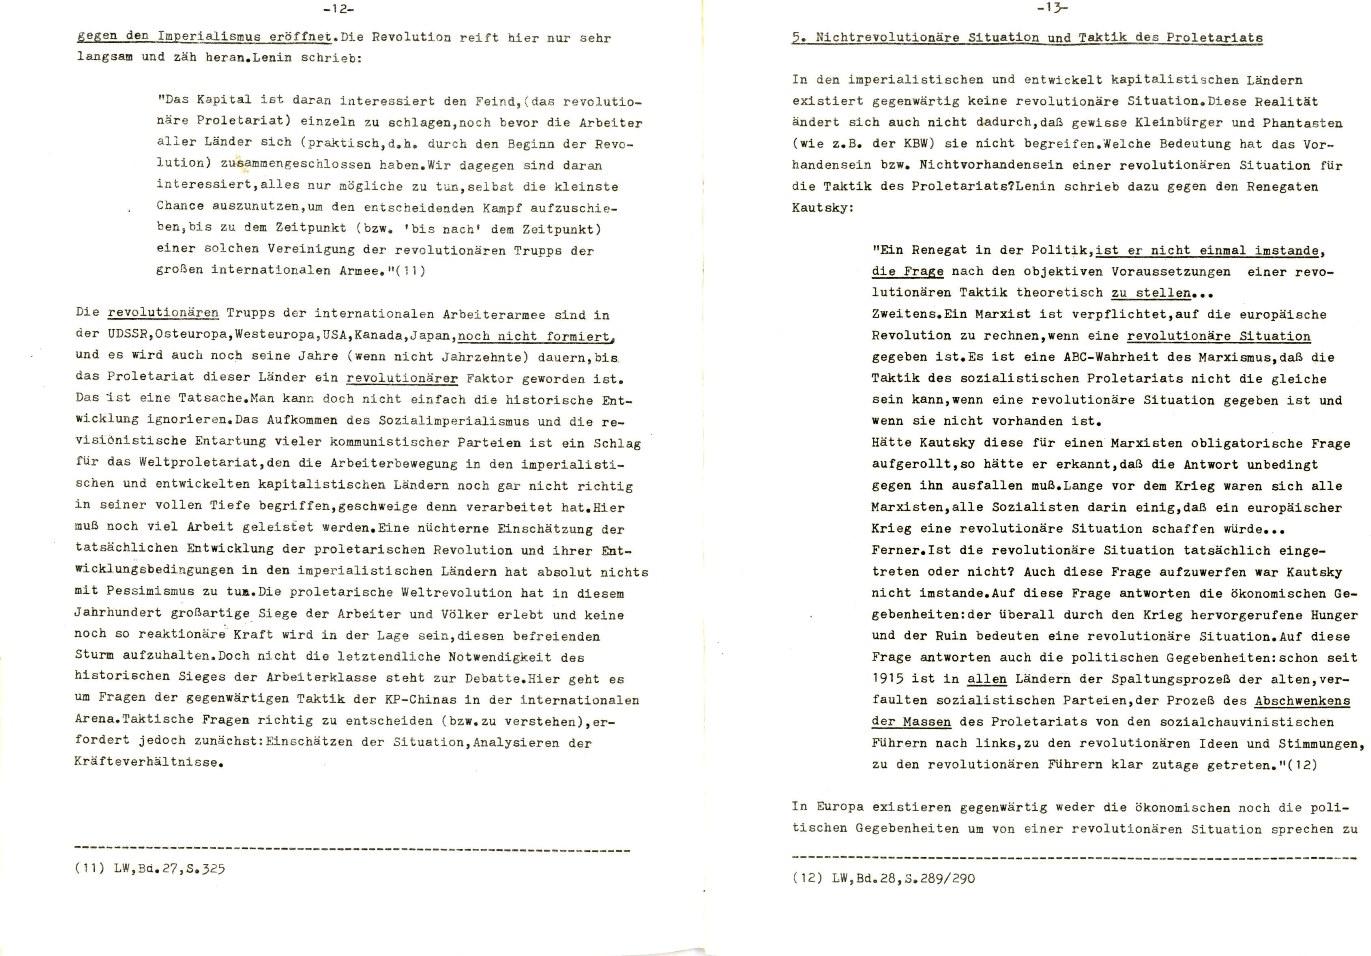 Muenchen_Kampf_dem_Revisionismus_1978_04_05_08